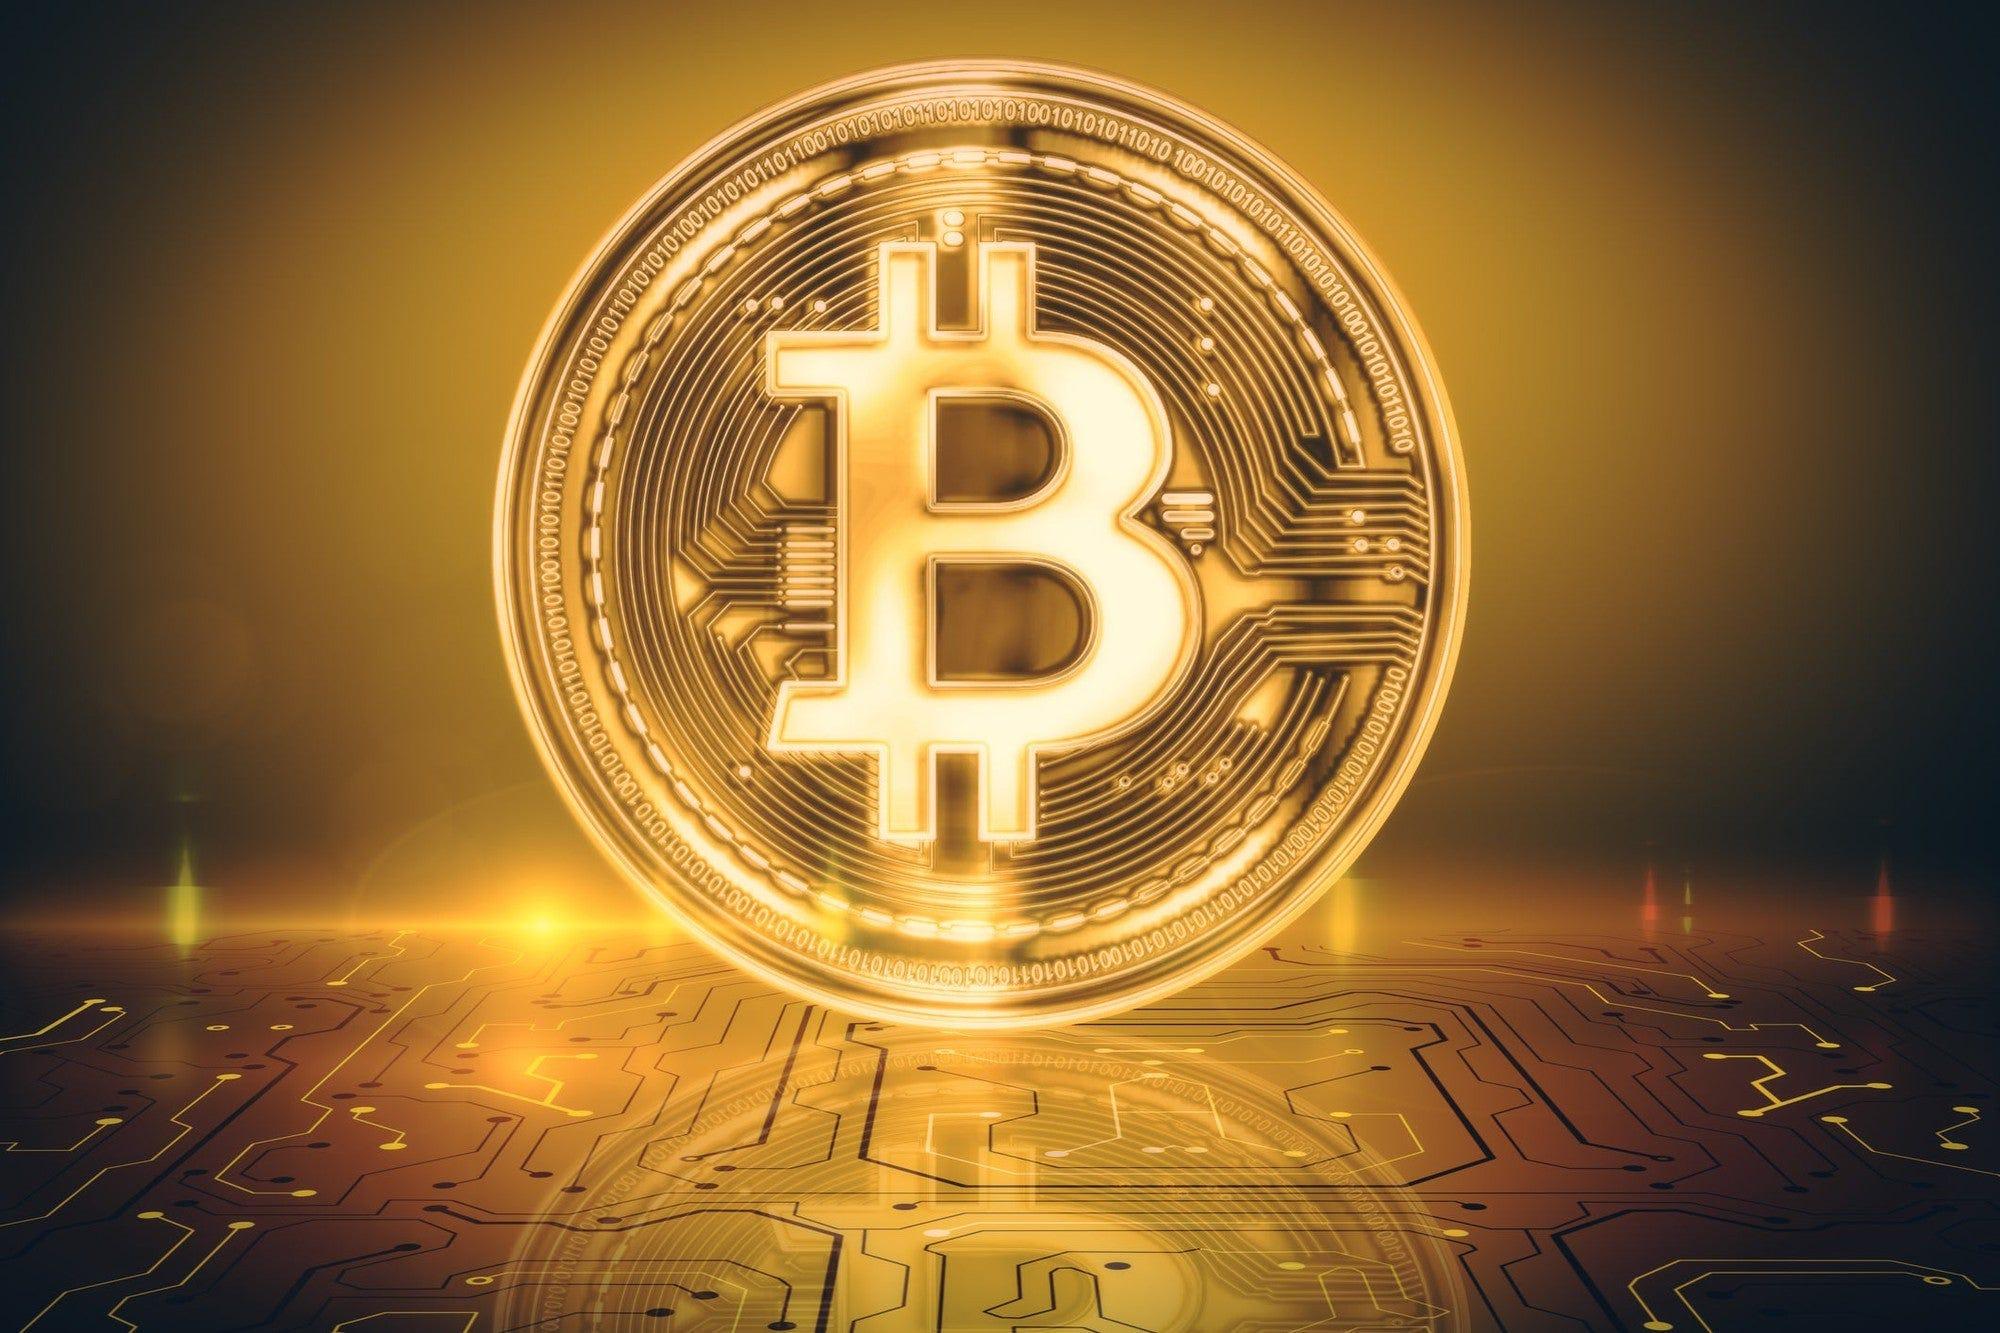 Bitcoin,BTC,ANALİZ,DOLAR,TEKNİK ANALİZ